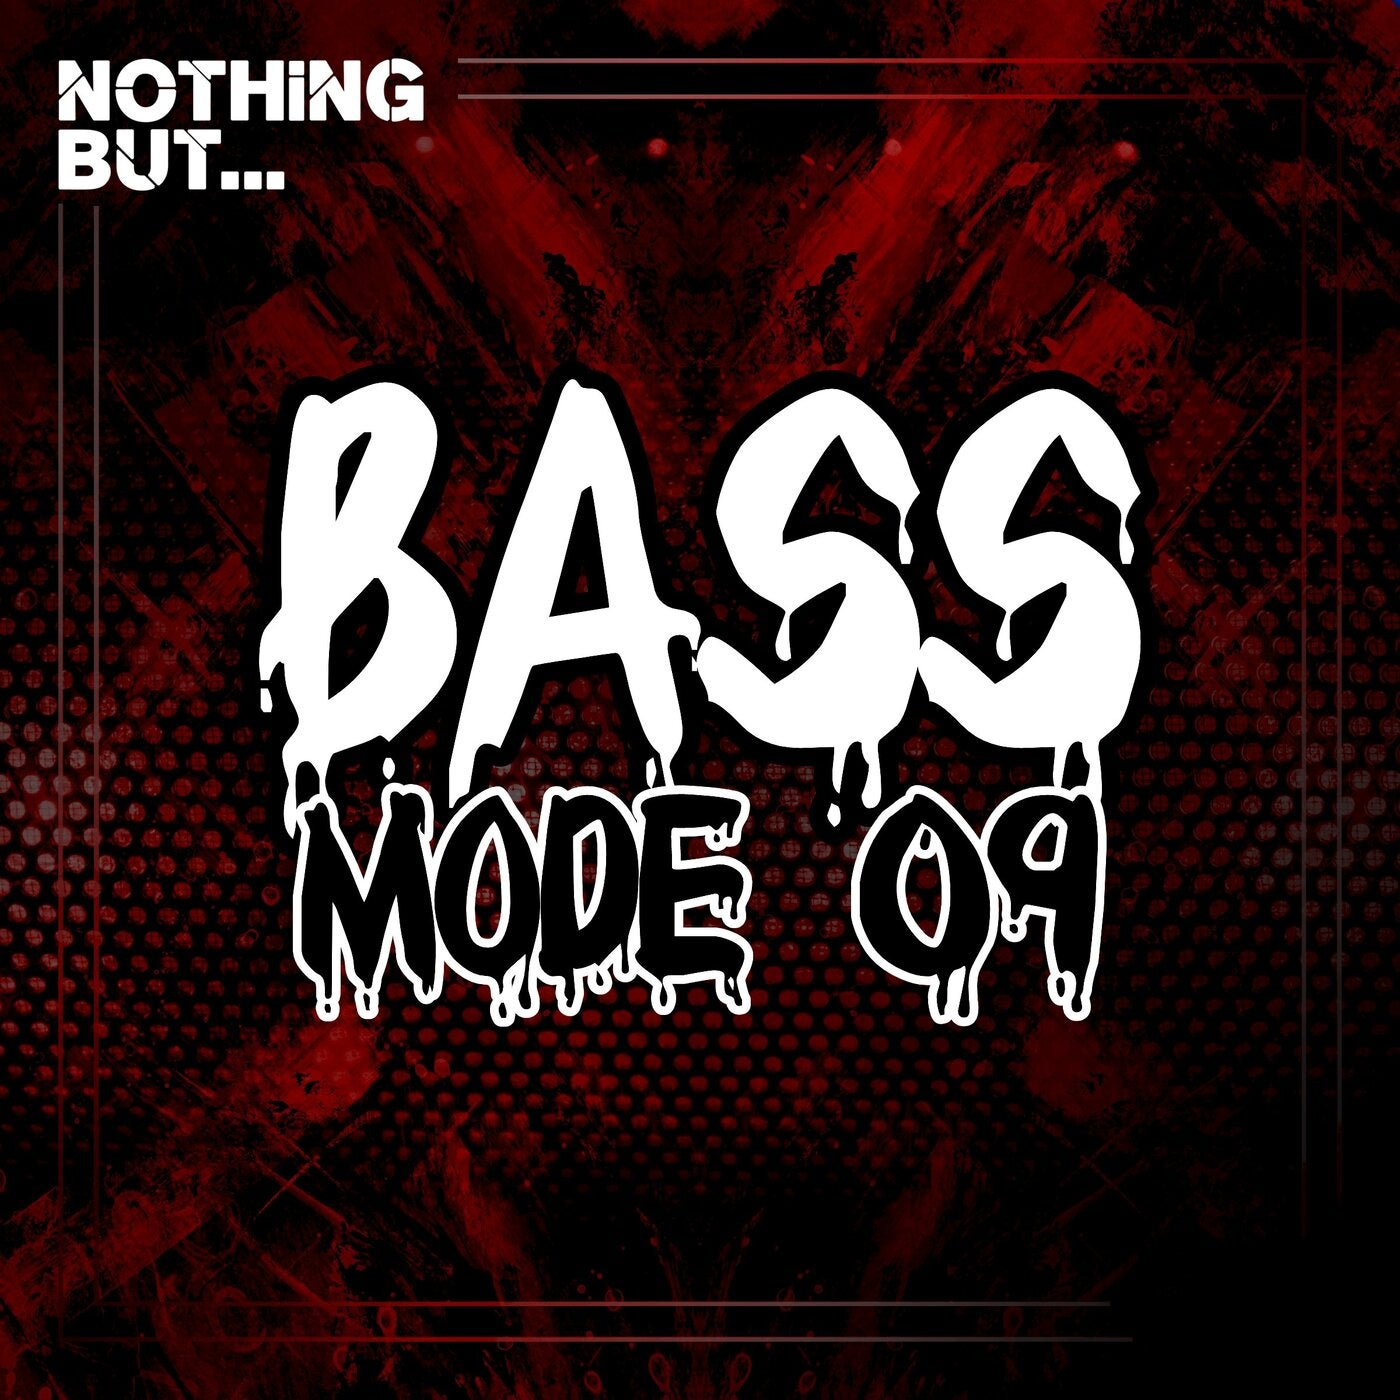 VA- Nothing But... Bass Mode, Vol. 09 [NBBM09]